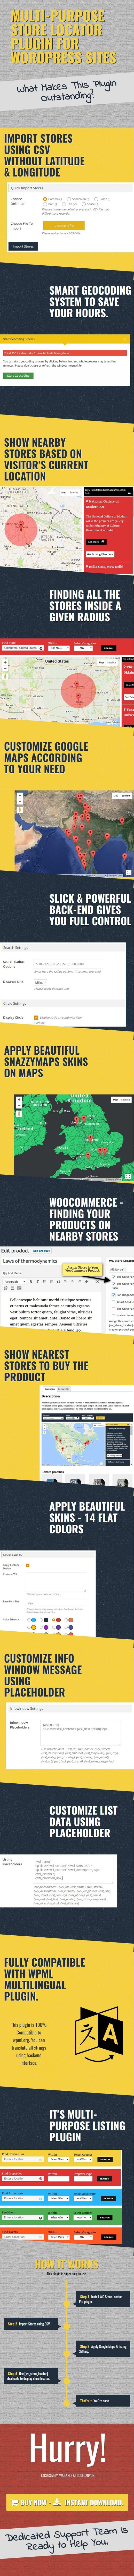 Store Locator Plugin for WordPress